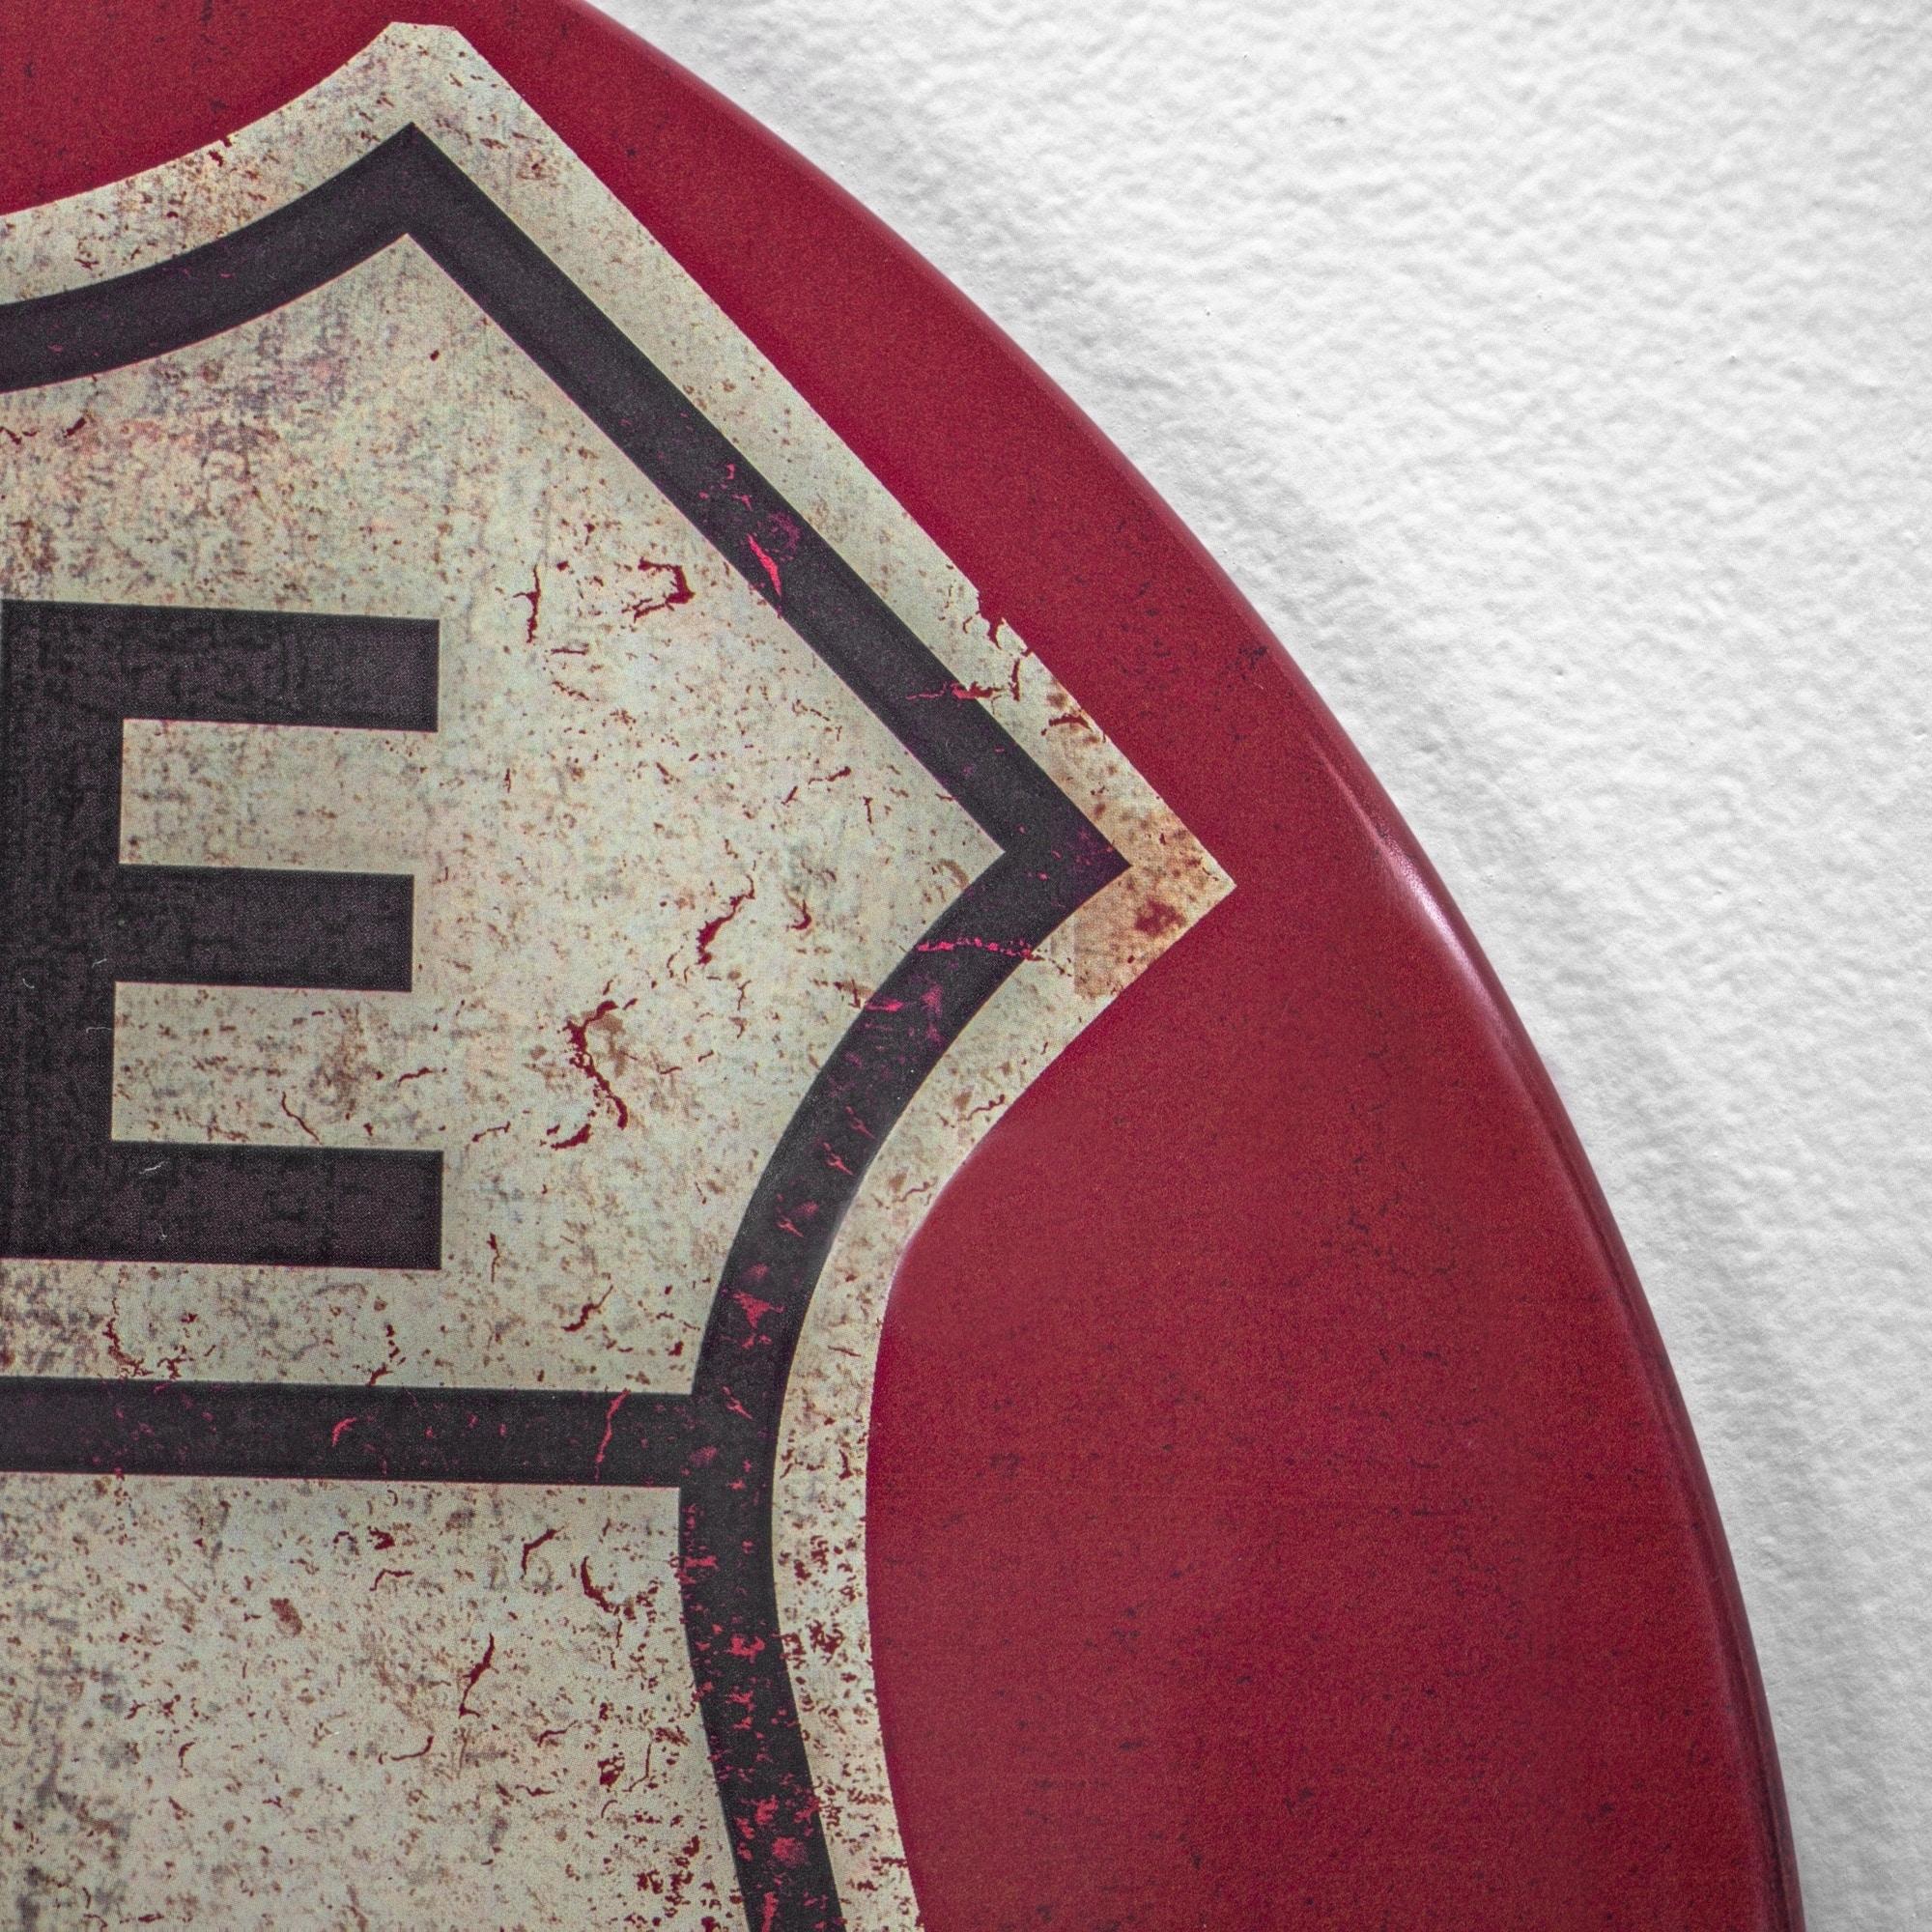 ARIZONA Route 66 Shield Metal Sign Man Cave Garage 211110014028 OATMAN